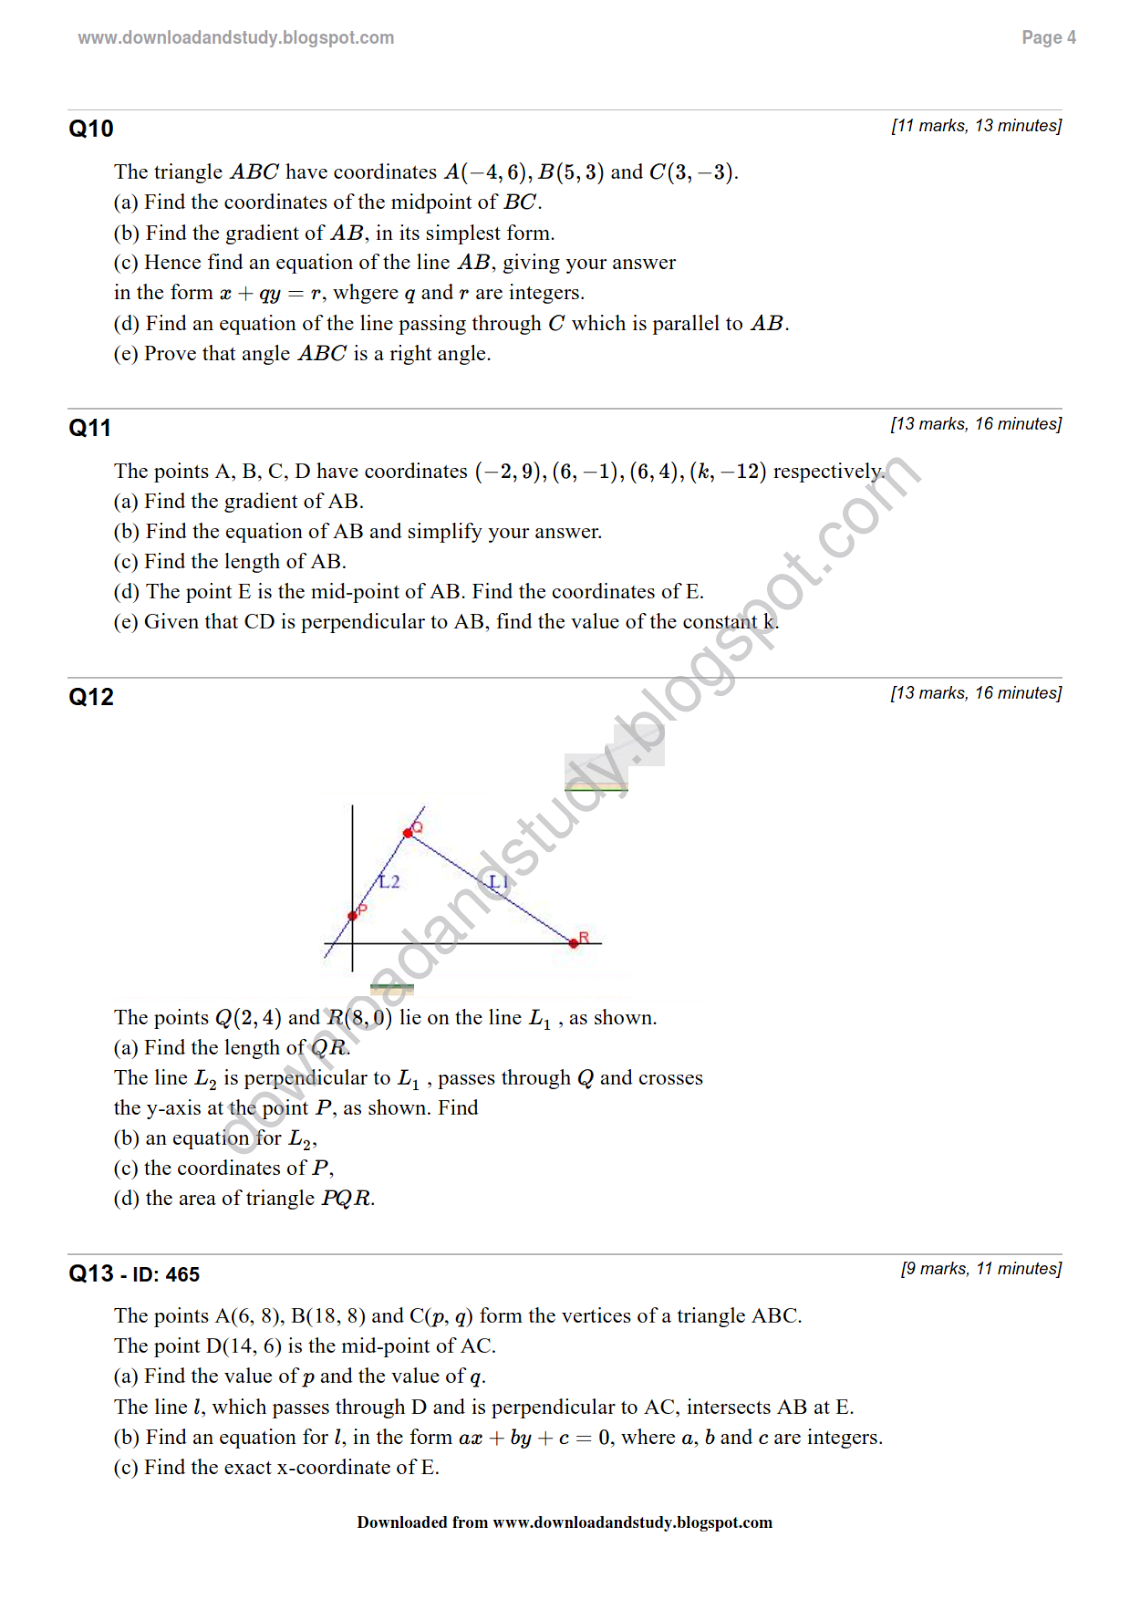 Worksheet Coordinate Geometry Worksheet Grass Fedjp